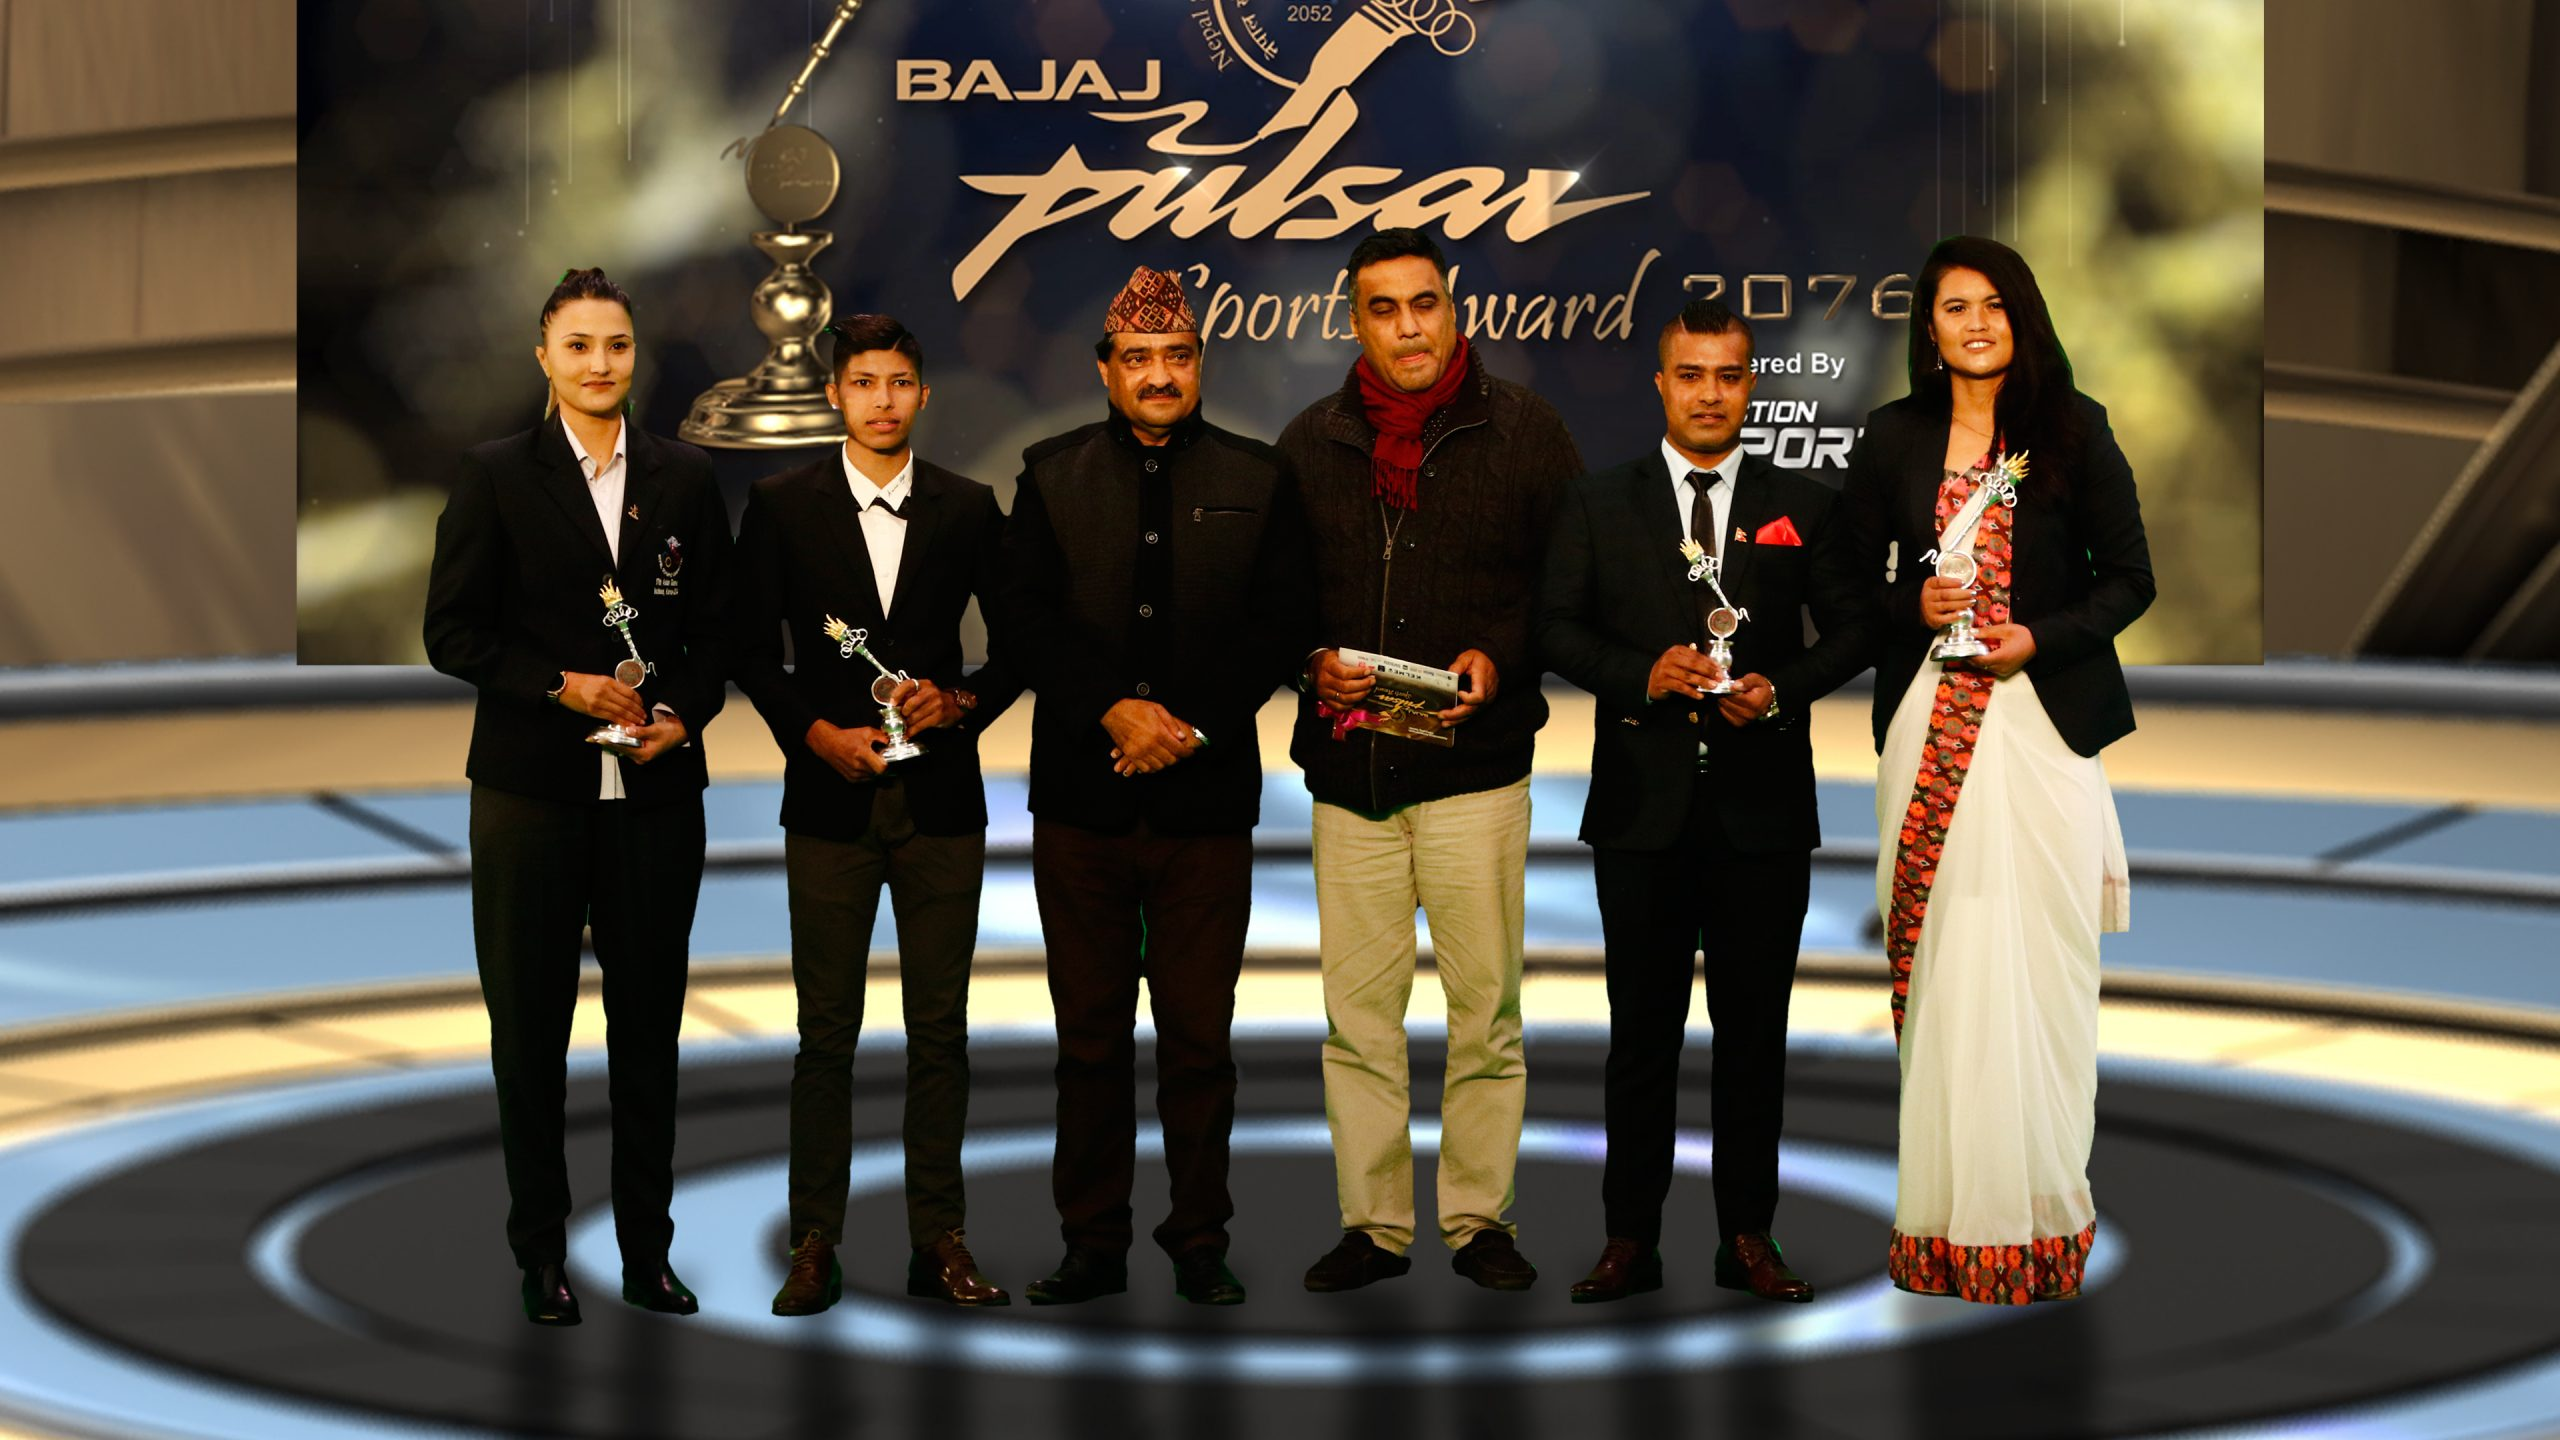 पल्सर स्पाेर्टस अवार्डमा मण्डेकाजी र गाैरीका बर्षकाे उत्कृष्ट खेलाडी, अरूणा पिपल्स च्वाइस विजेता